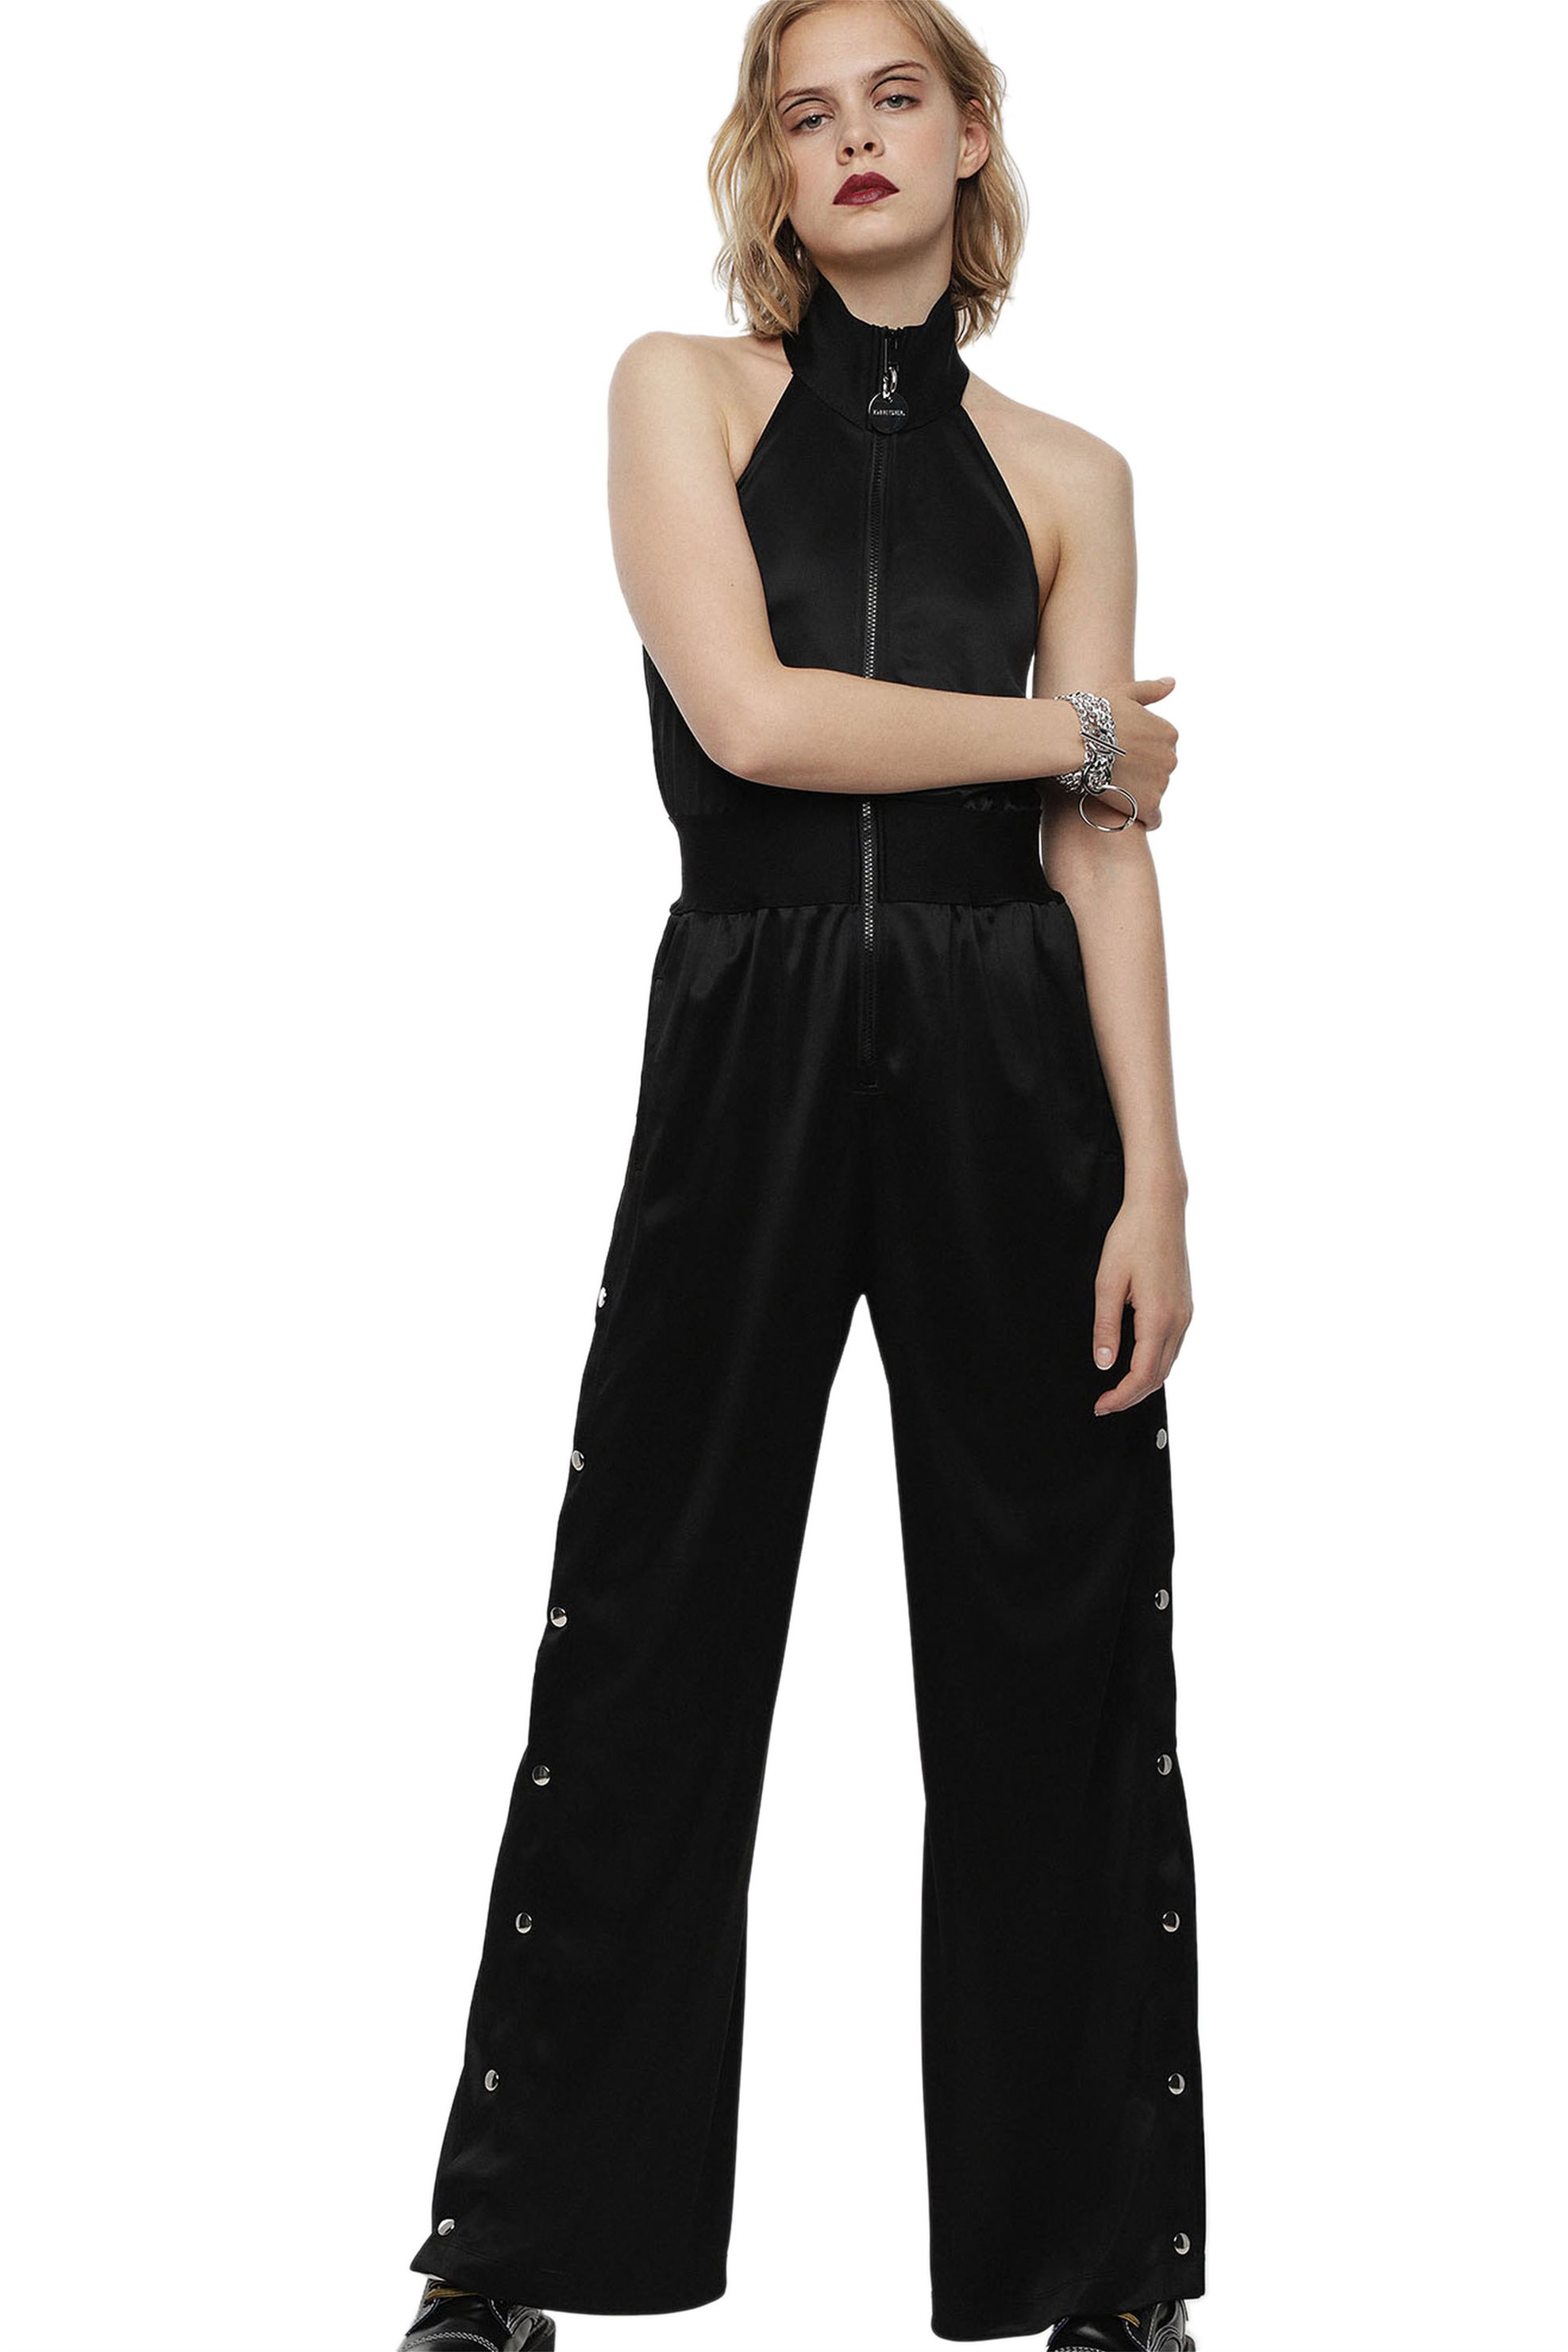 Diesel γυναικεία ολόσωμη φόρμα J-Sasja - 00SH2V 0CARX - Μαύρο γυναικα   ρουχα   ολόσωμες φόρμες   σαλοπέτες